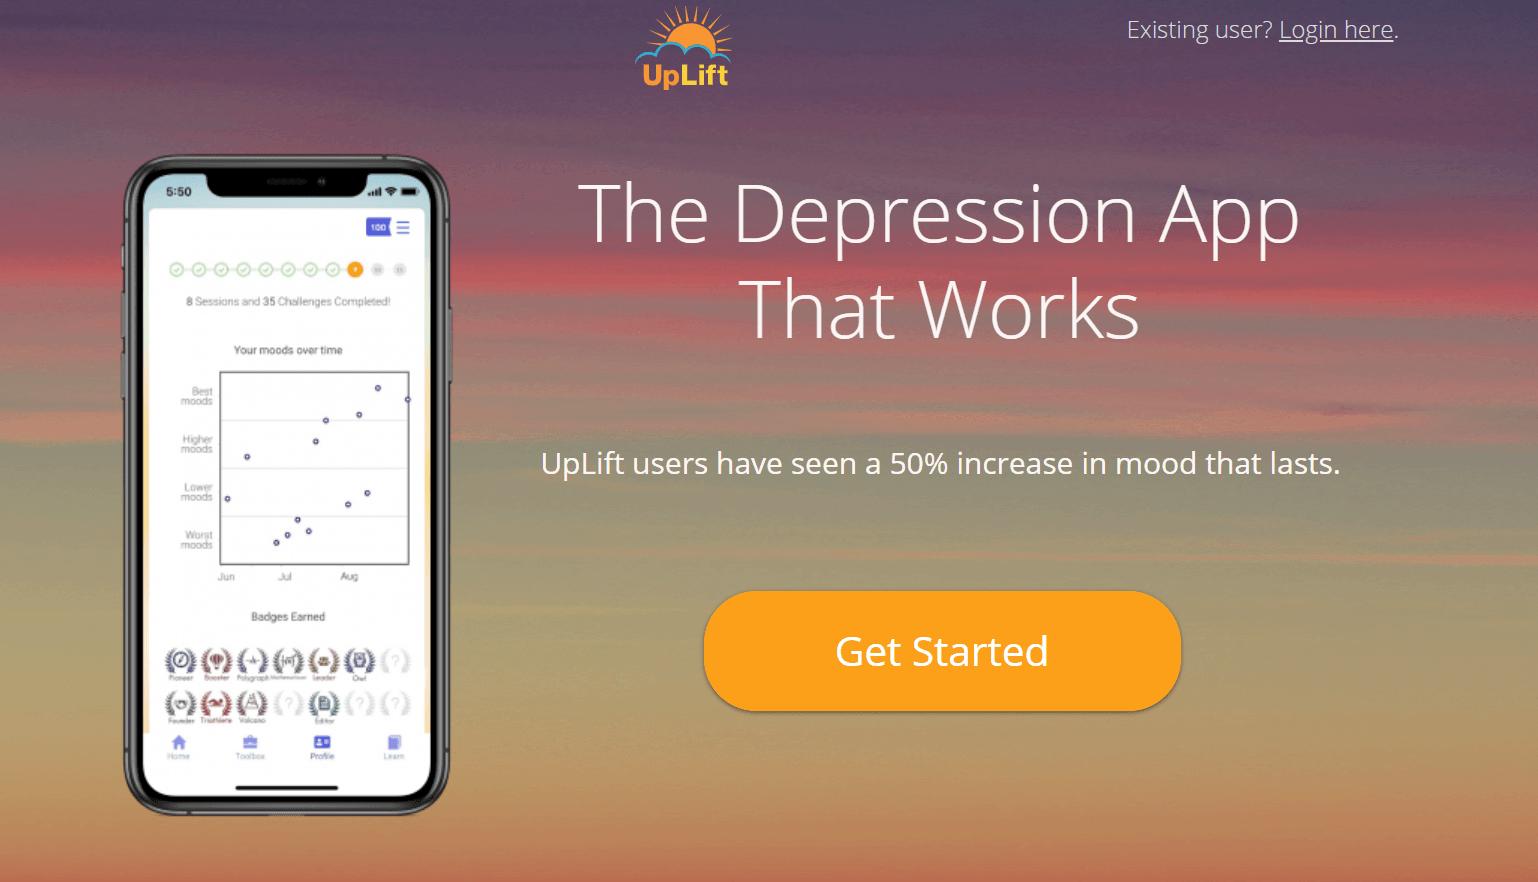 Depression App UpLift Raises $1M to Help People Fight Depression